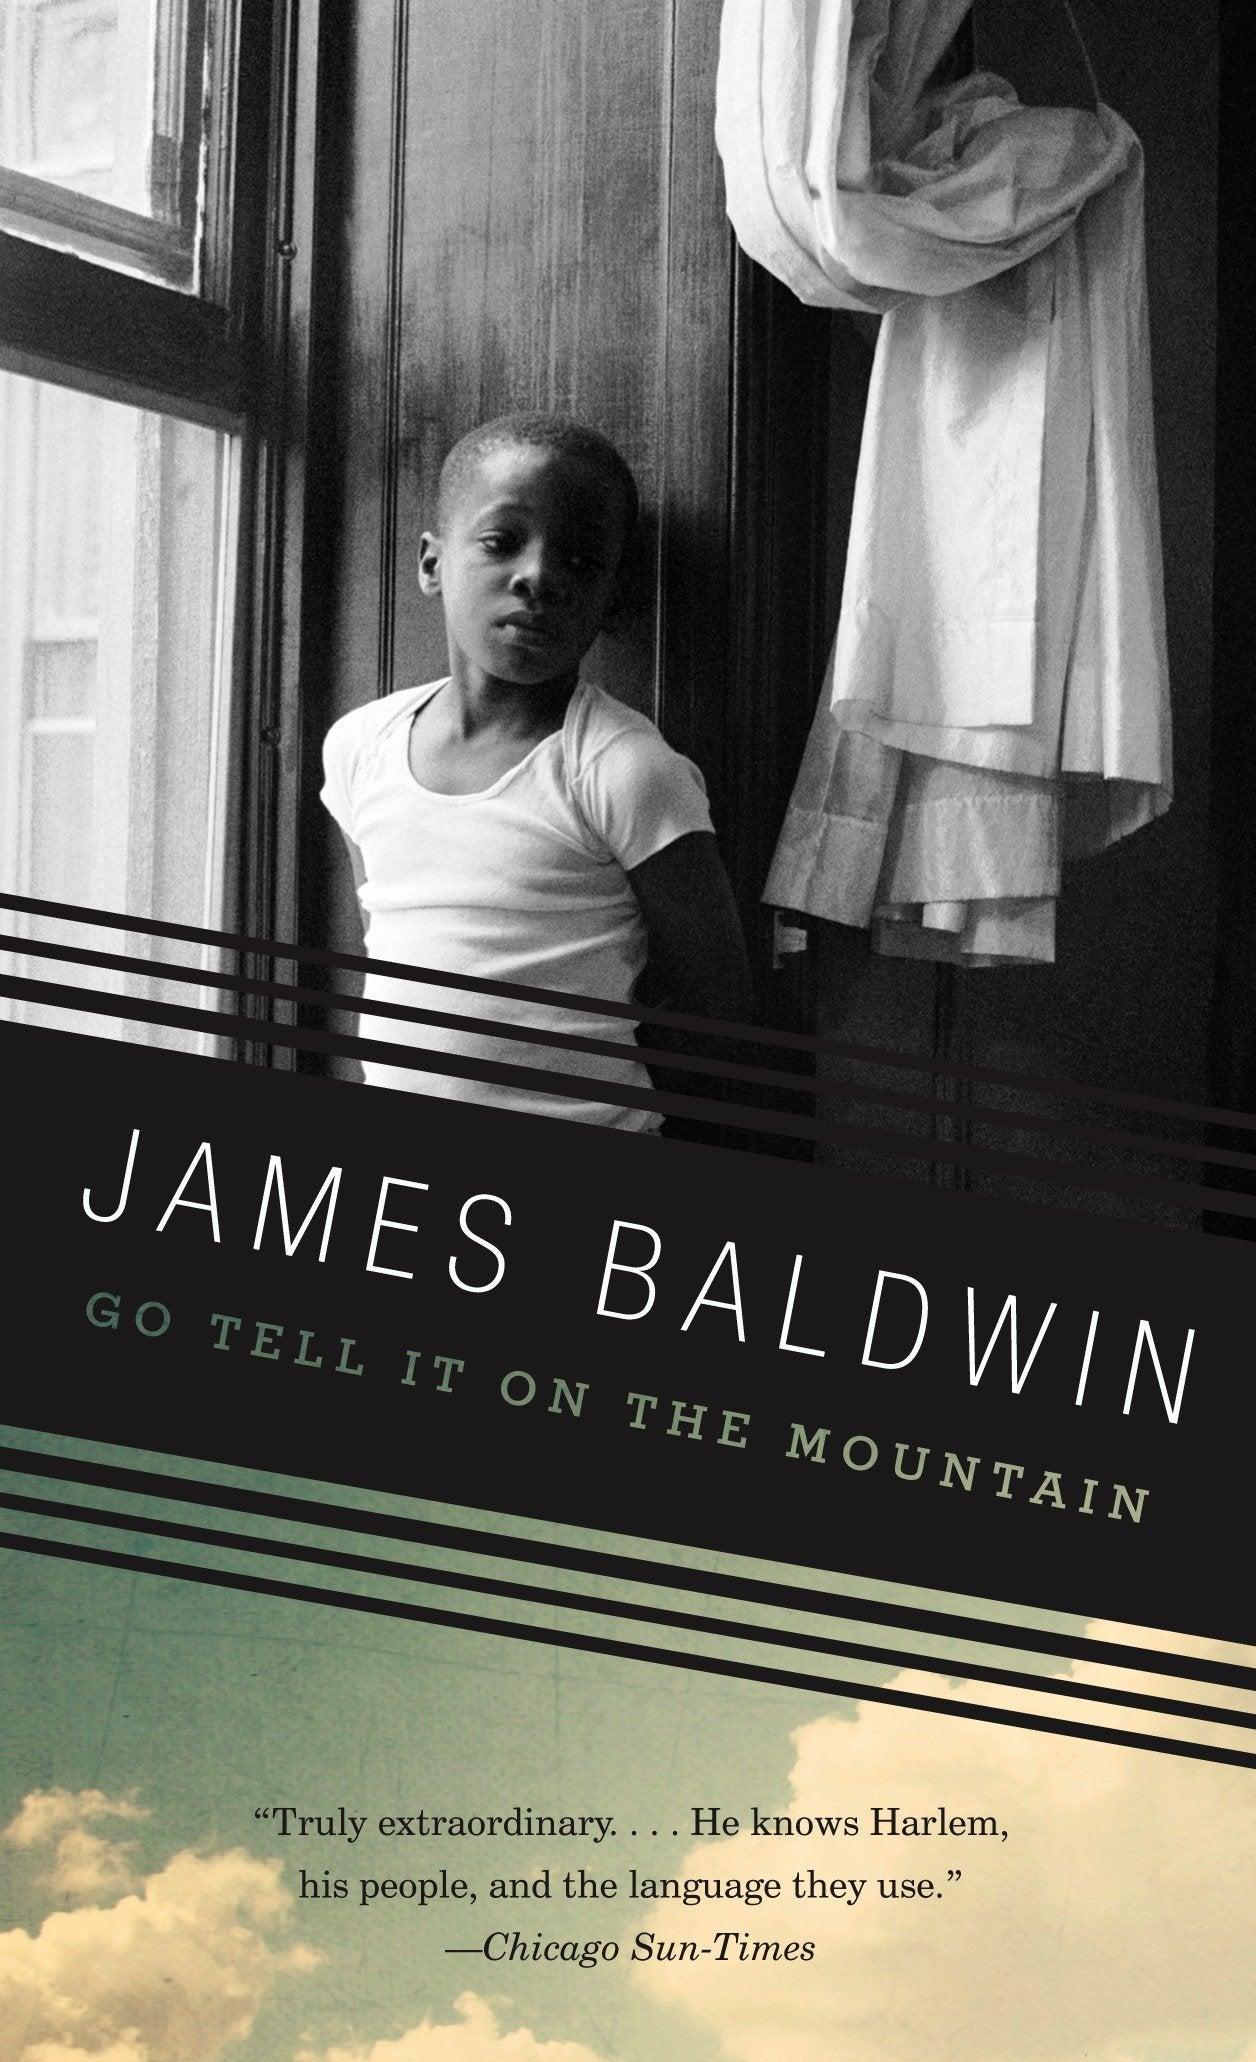 Go-Tell-It-On-The-Mountain-James-Baldwin.jpg